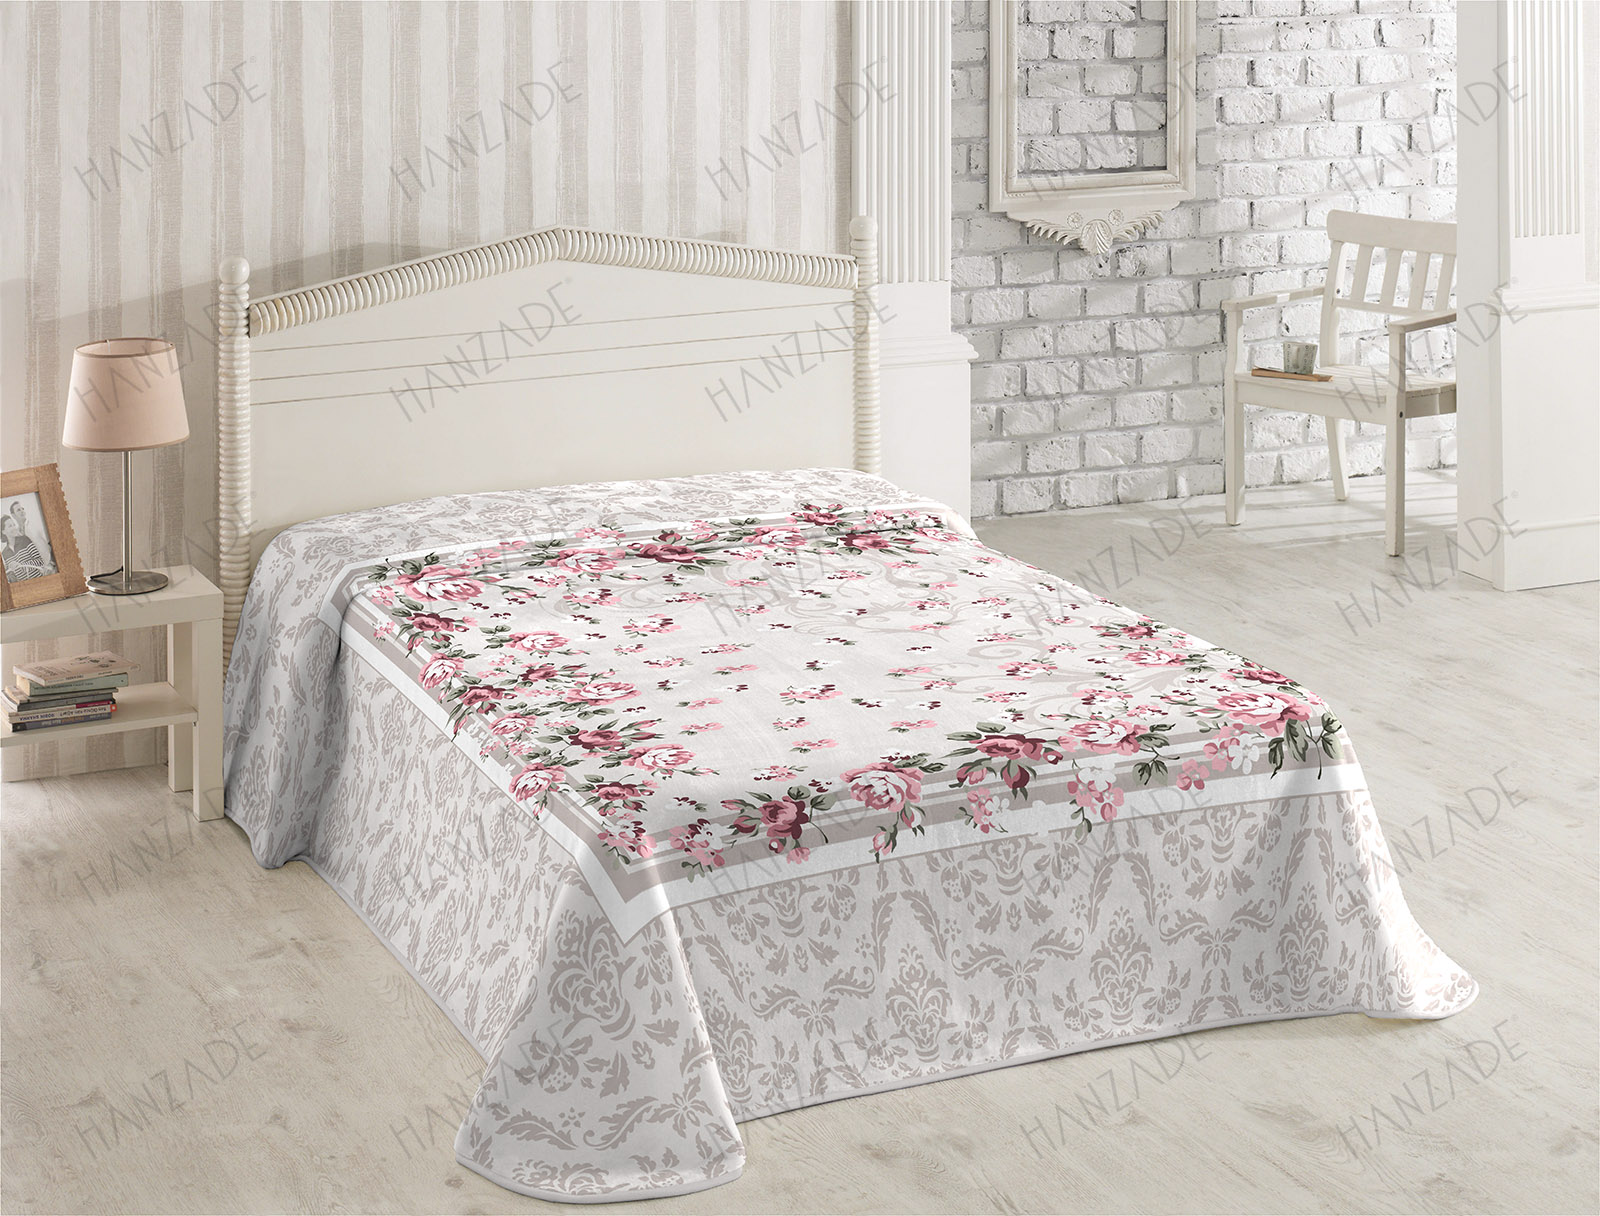 Alinda Blanket